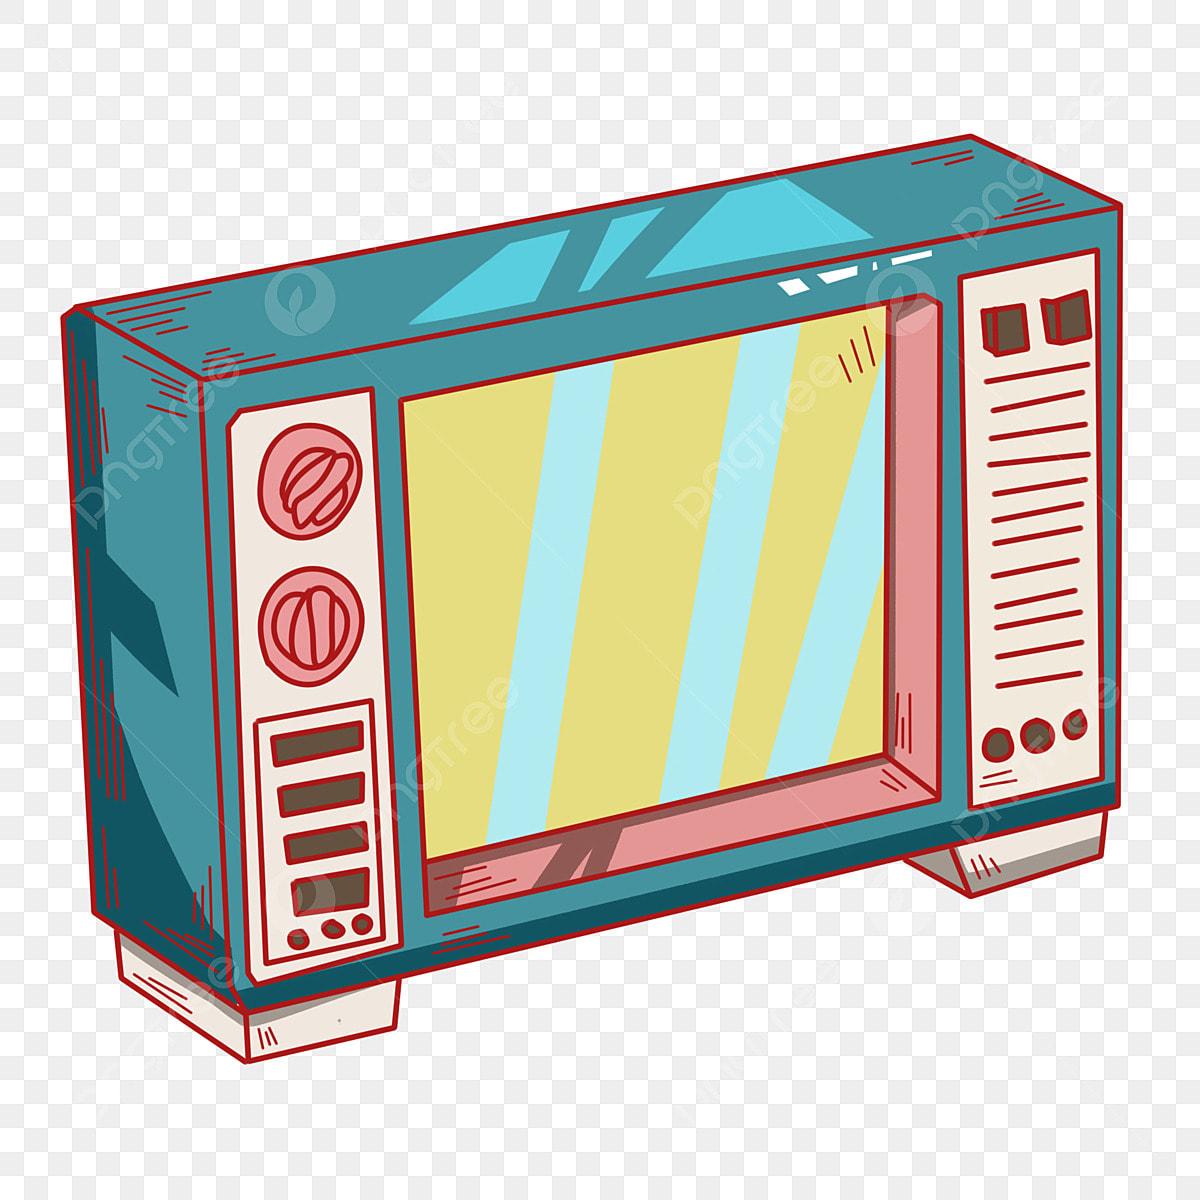 780 Gambar Animasi Peralatan Rumah Tangga HD